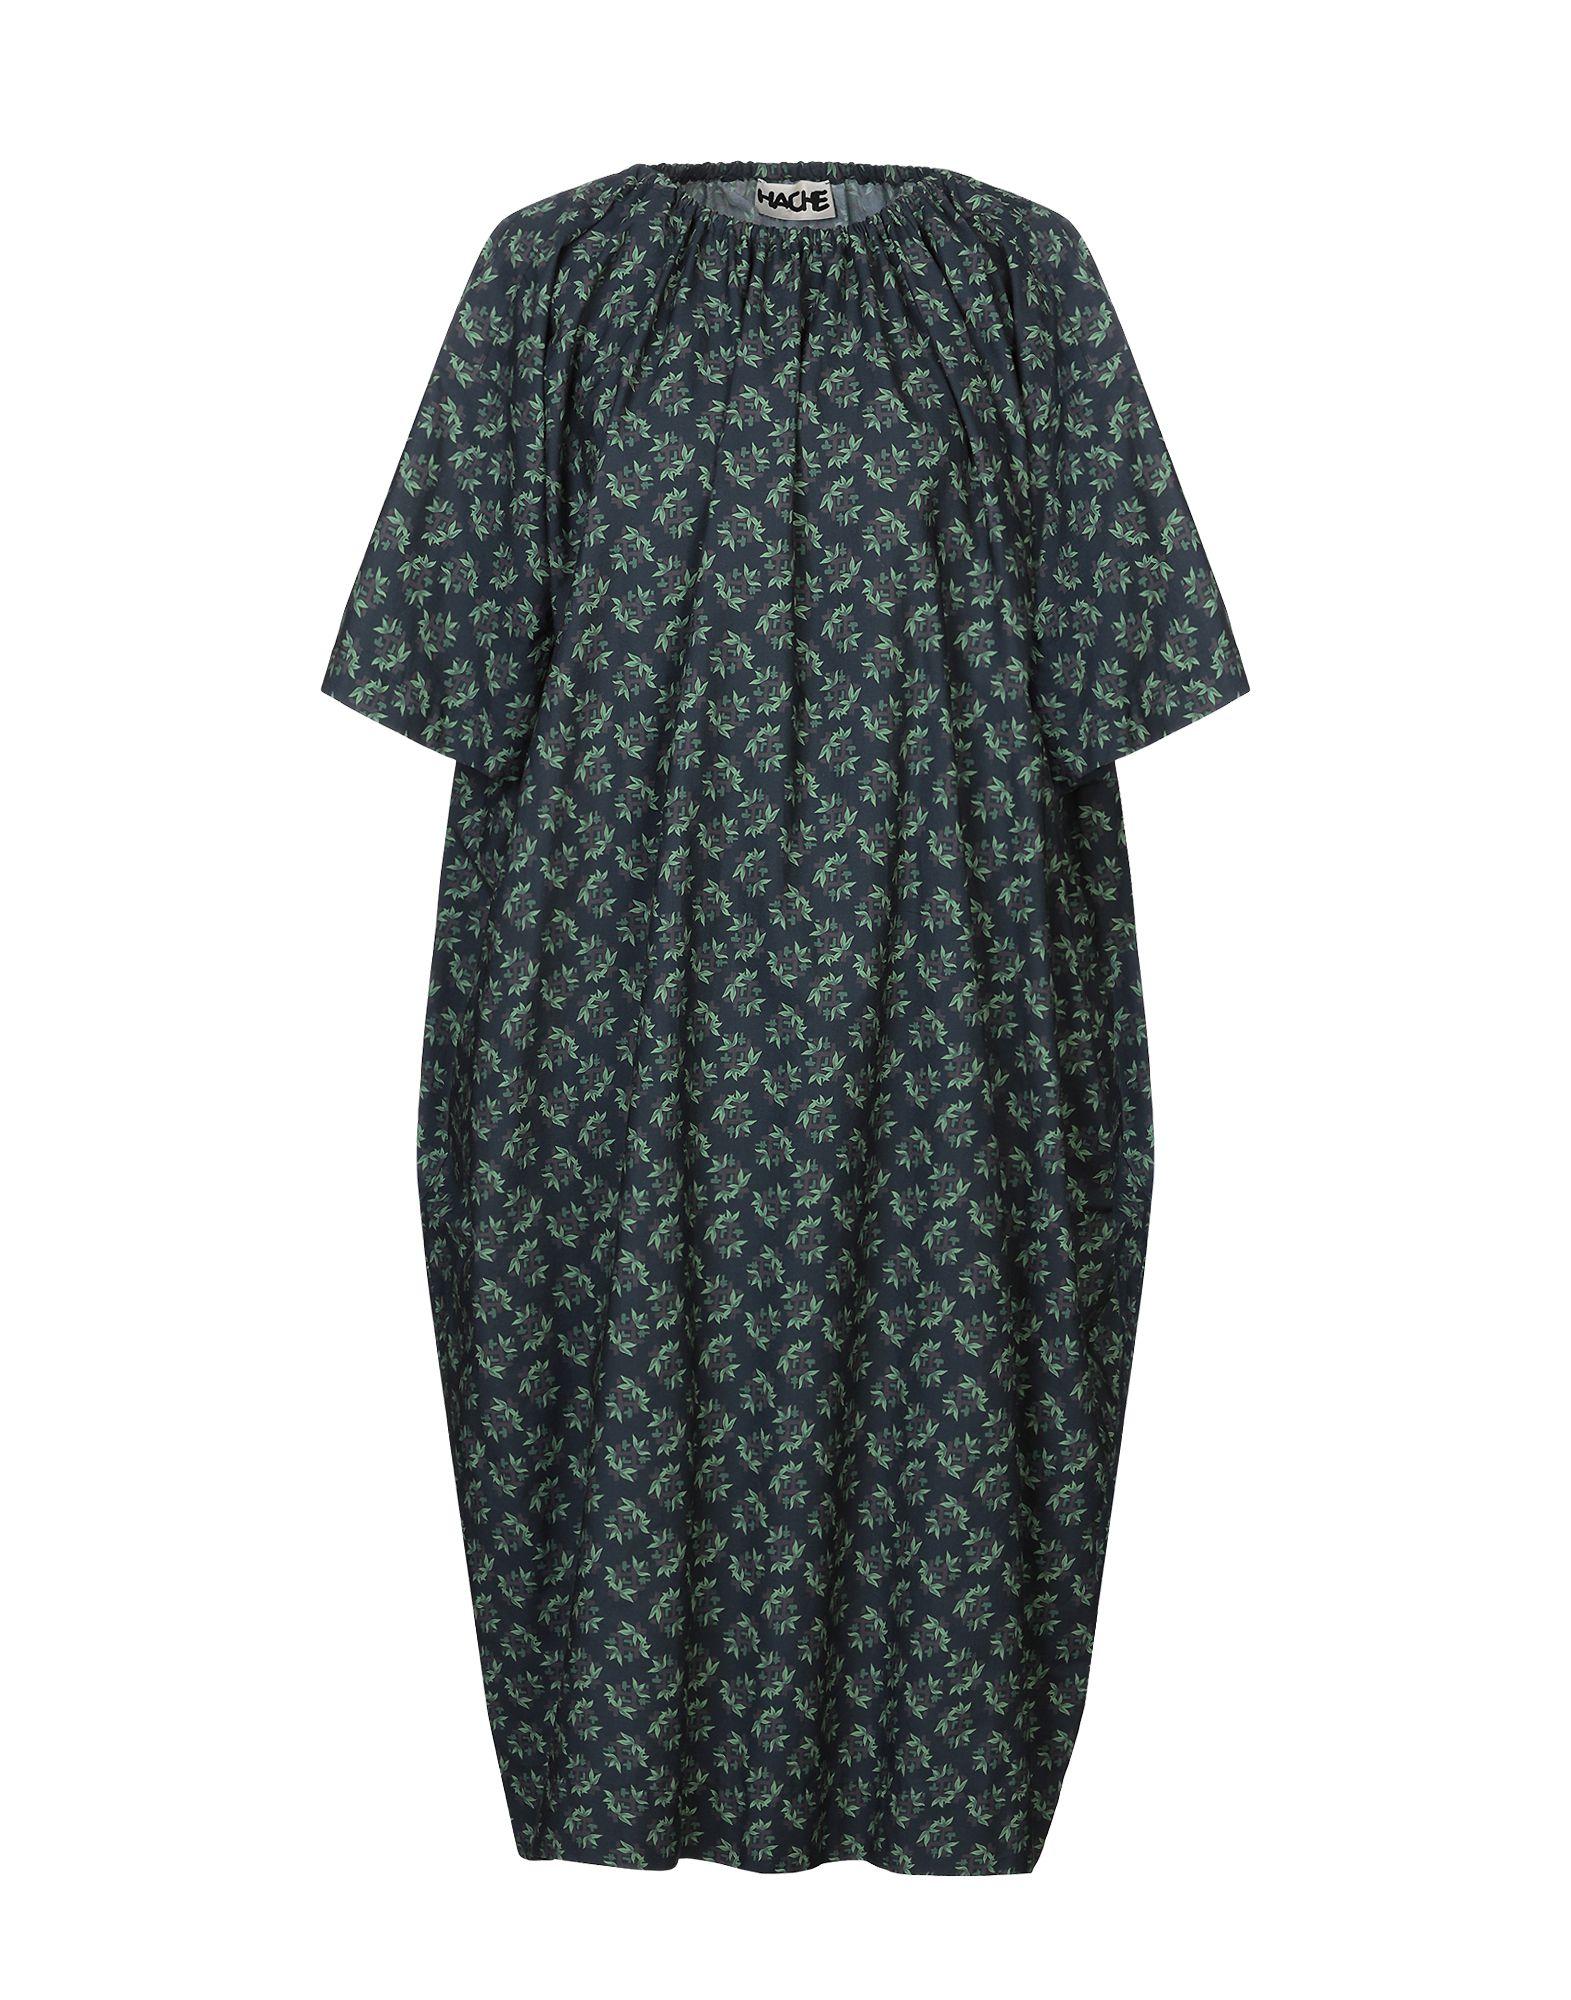 HACHE Платье длиной 3/4 цены онлайн